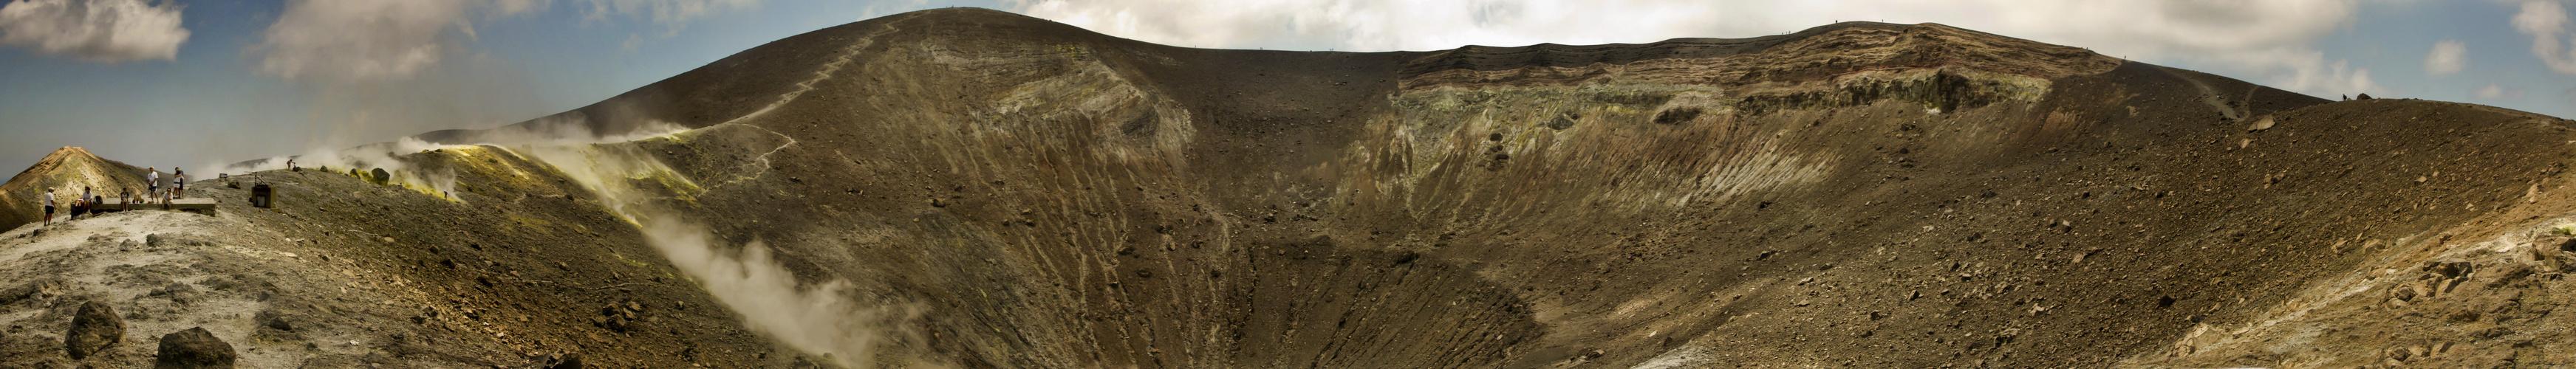 Vulcano-Kraterpanorama